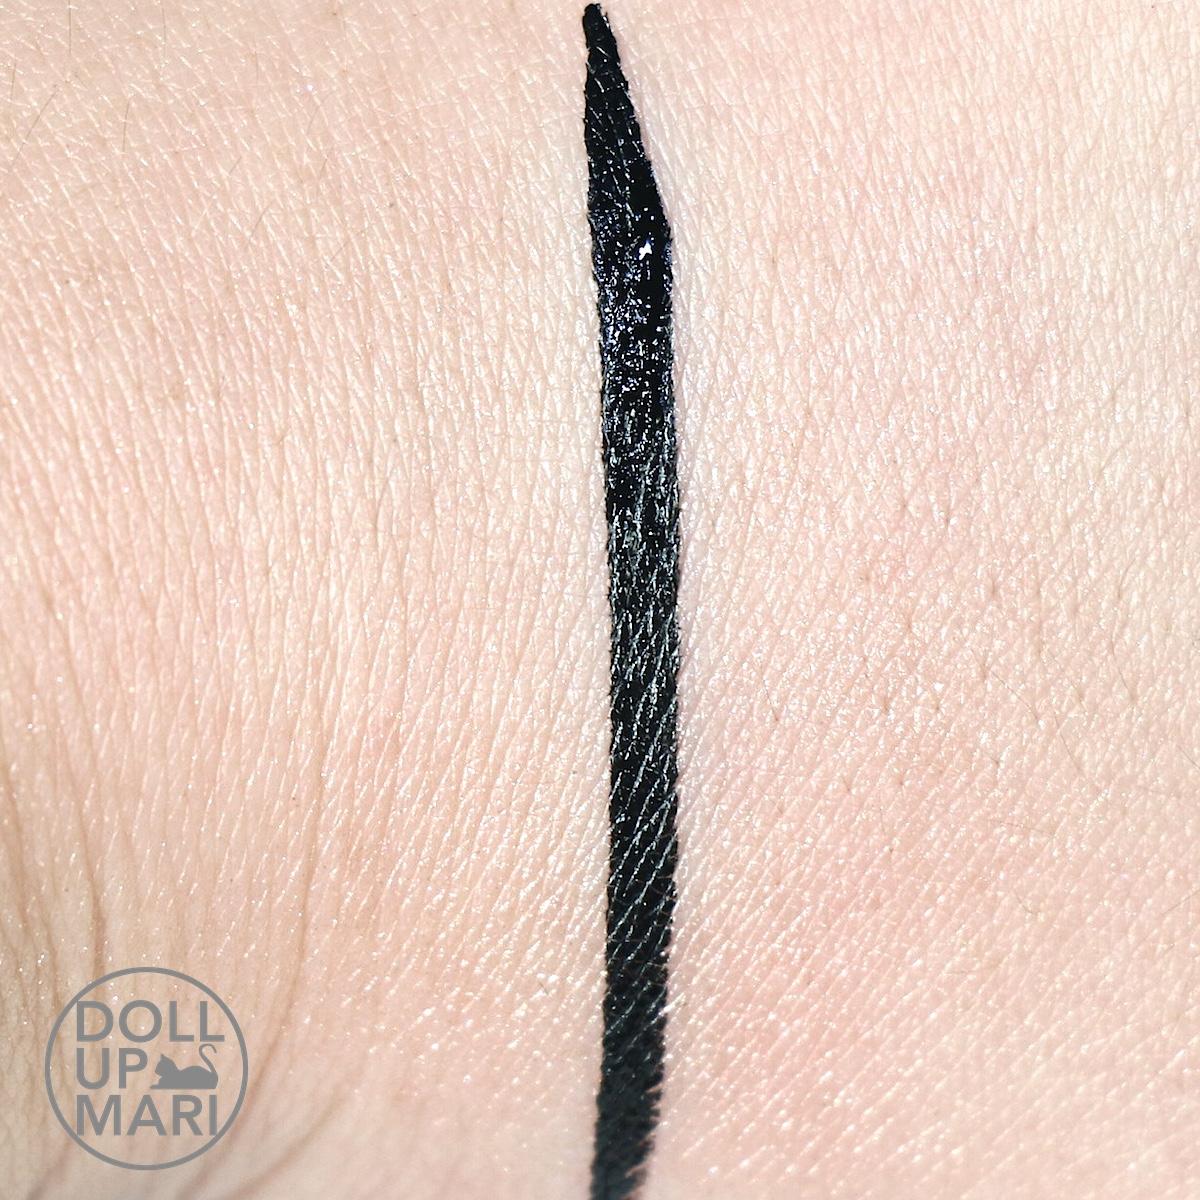 Maybelline Hyperink Liquid Dip Pen Eyeliner Review And Swatches Hyper Ink Eye Liner Black Swatch